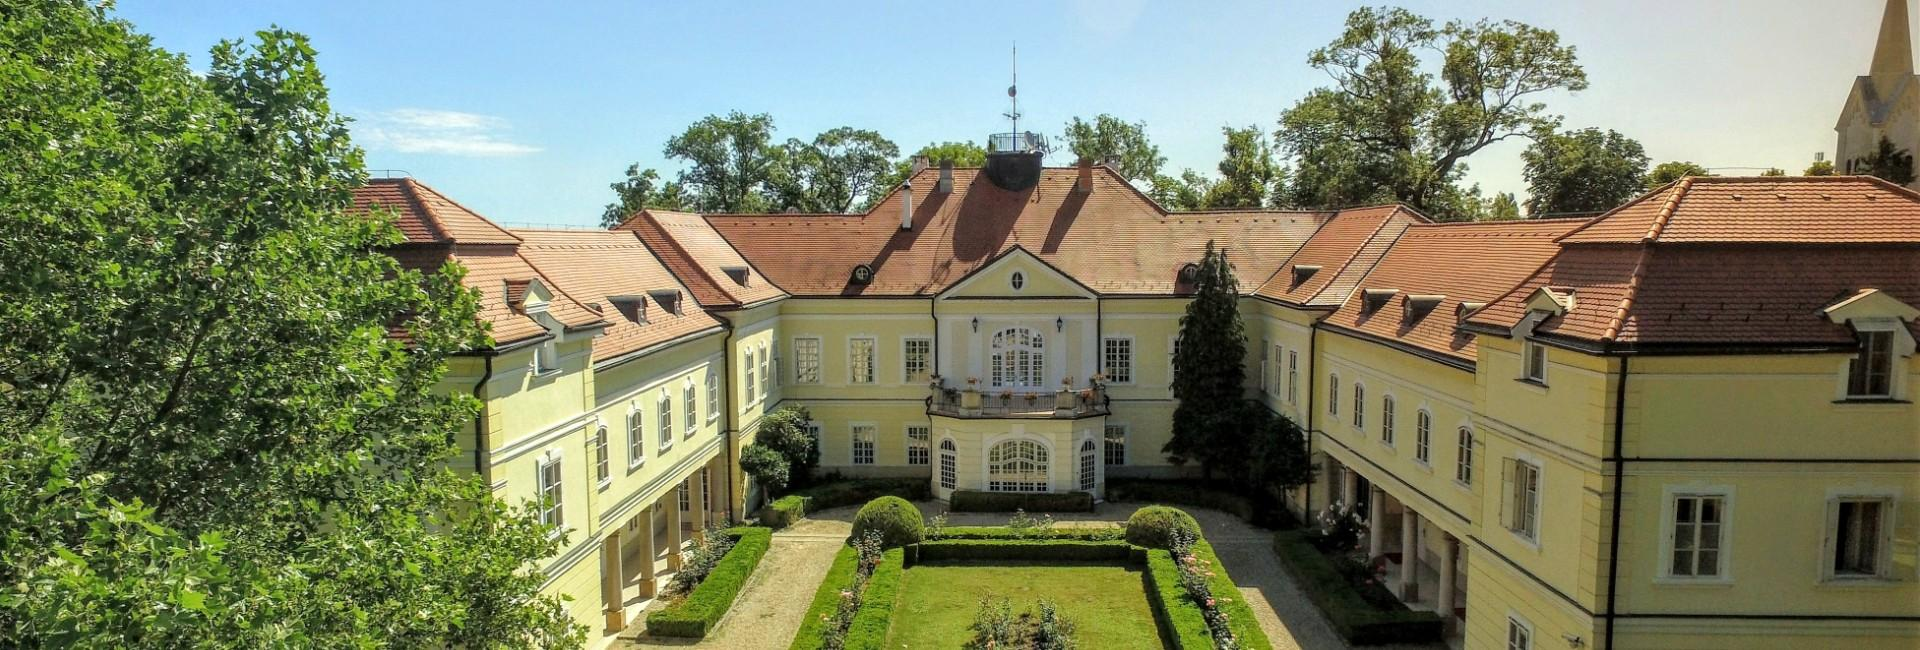 Castle Hotel Szidónia in Röjtökmuzsaj near lake Neusiedlersee